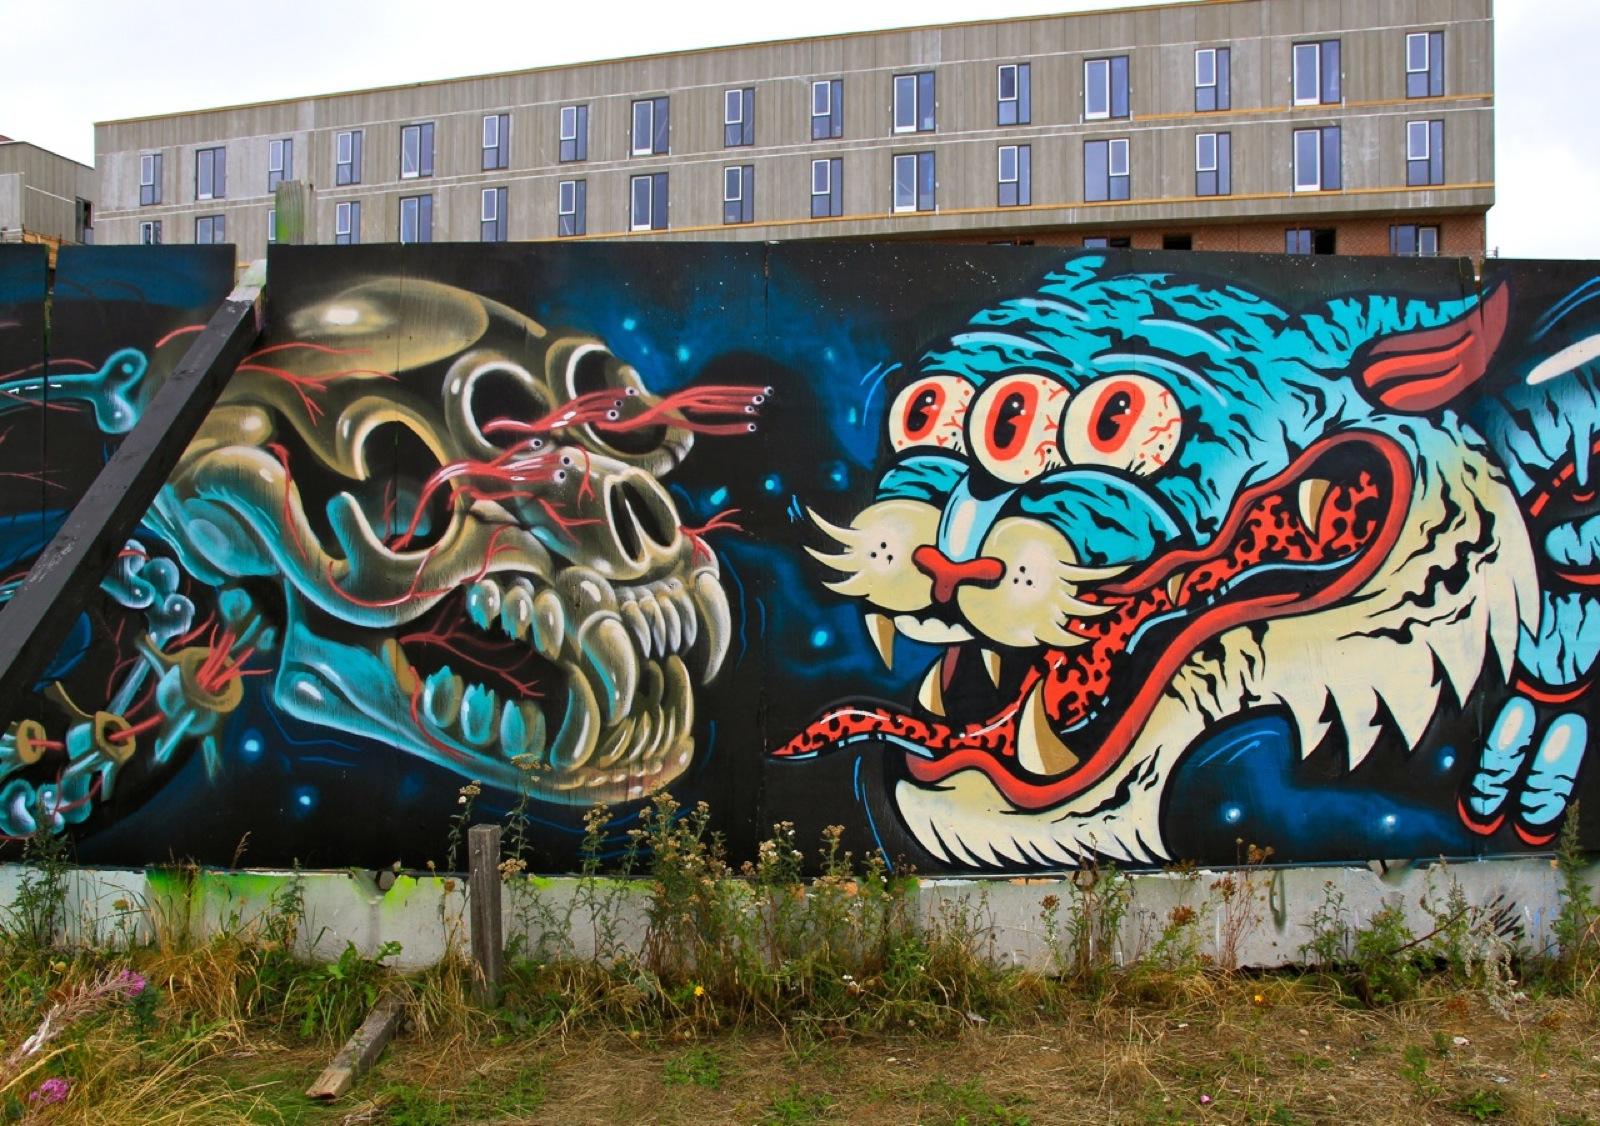 Nychos x dxtr x gevaer new mural in copenhagen denmark for Mural street art